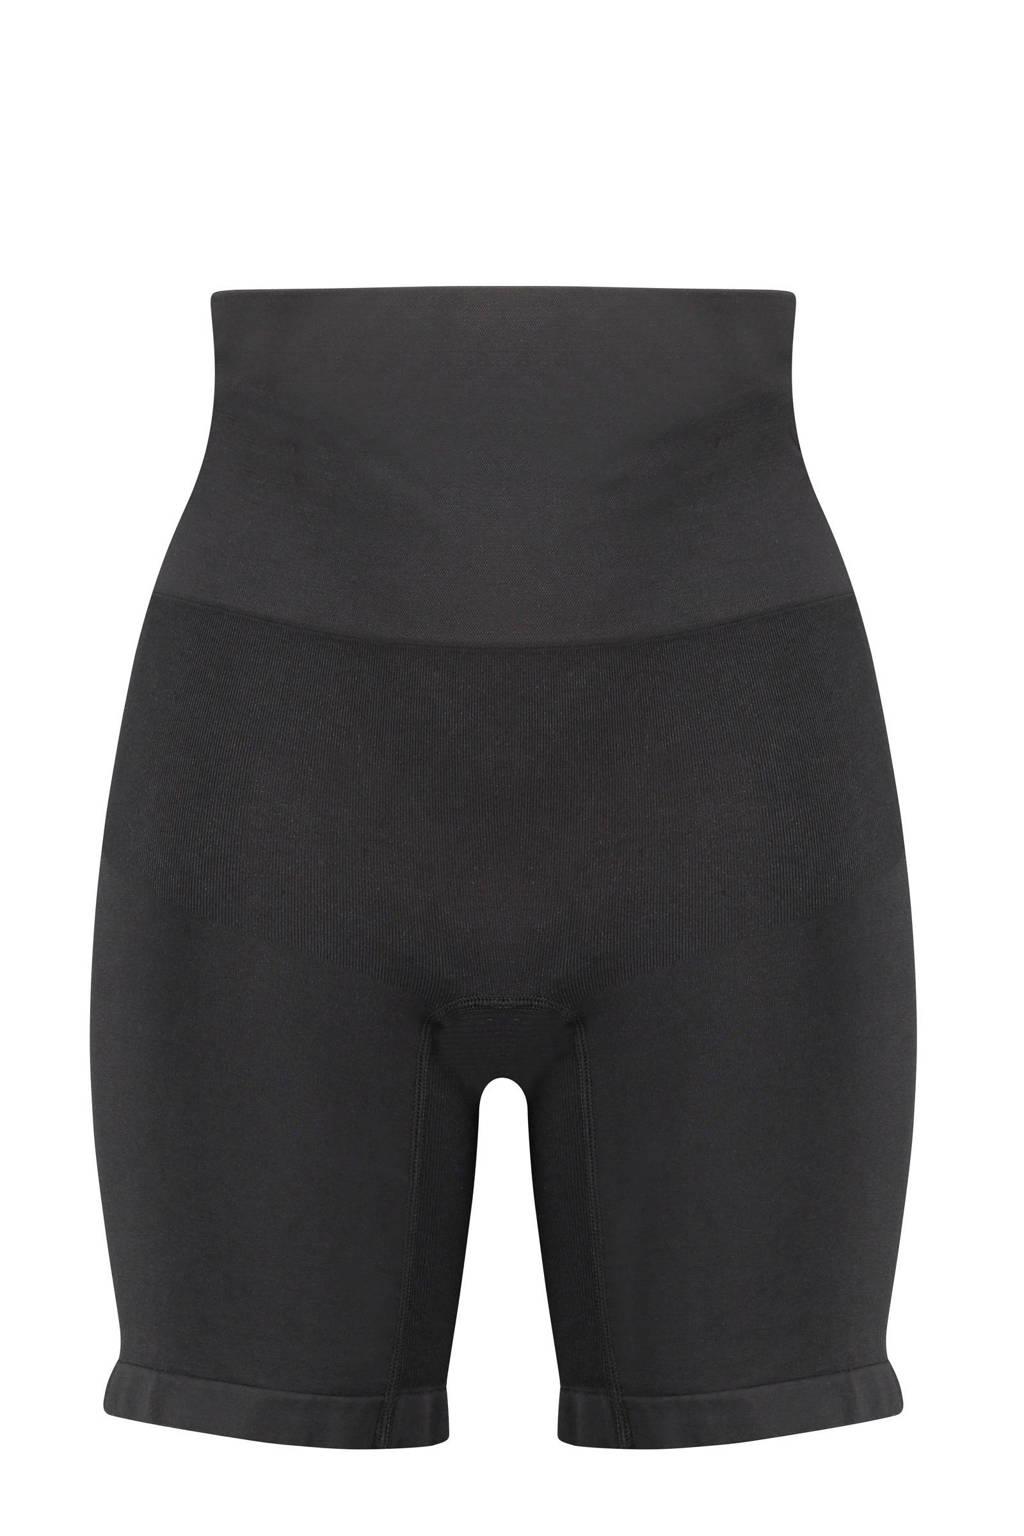 Hunkemöller corrigerende short zwart, Zwart